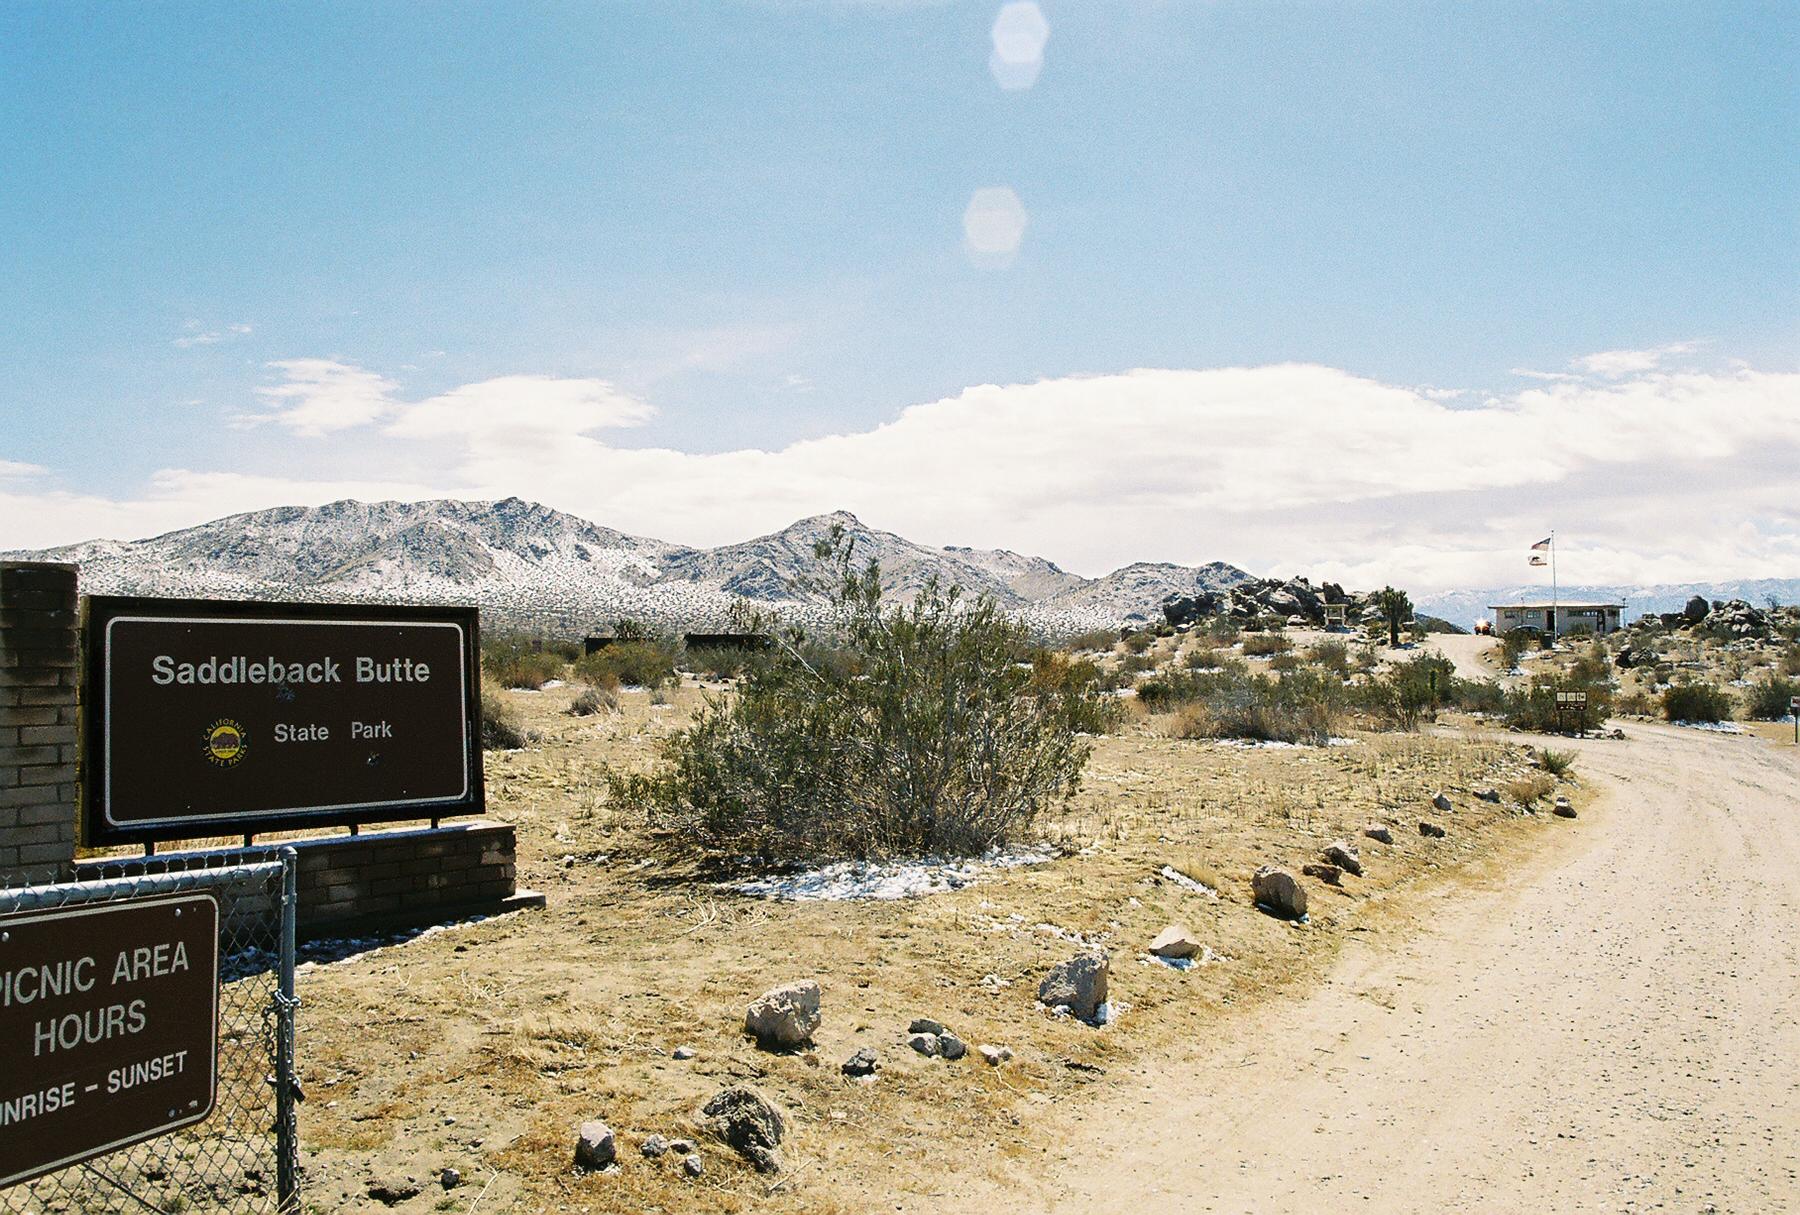 Image from Saddleback Butte SP